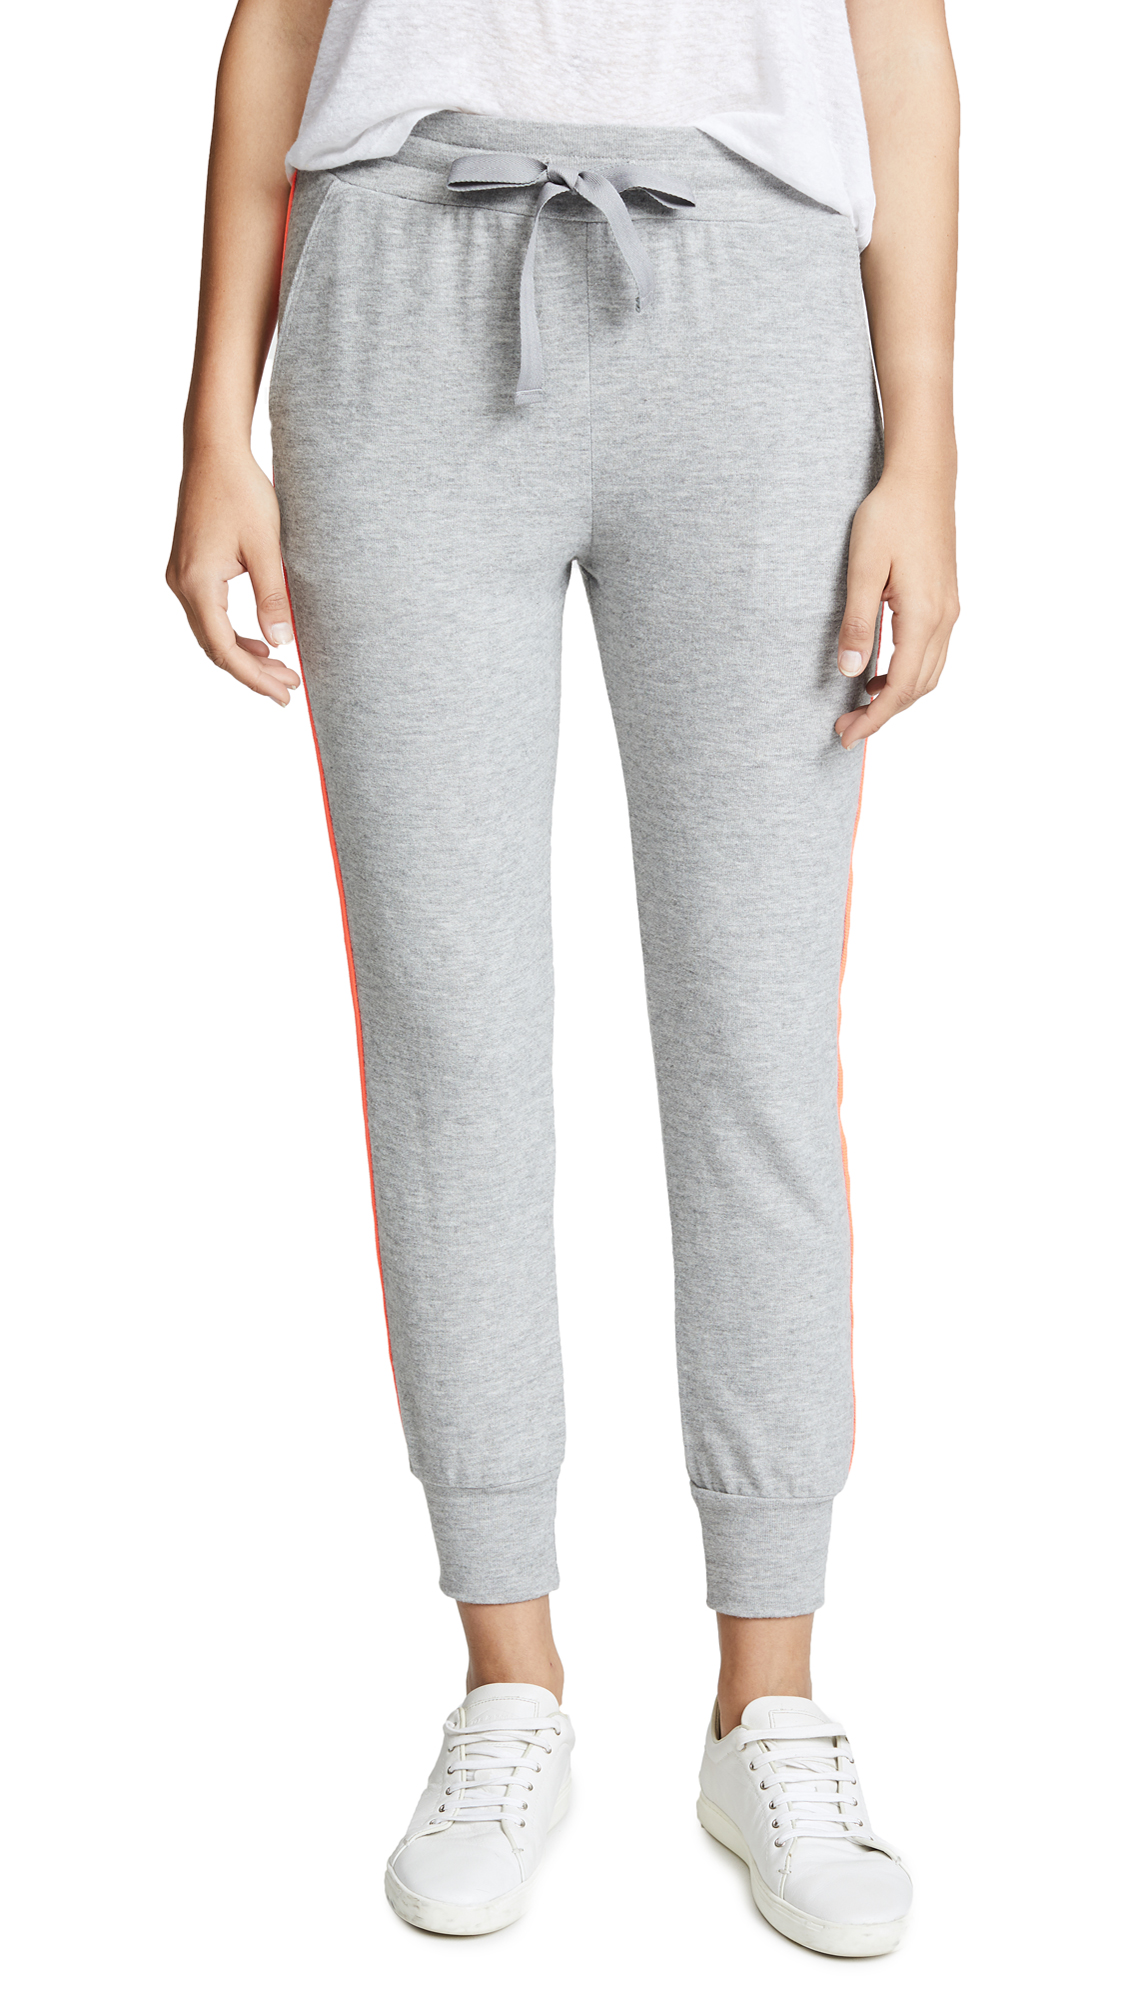 SUNDRY Jogger Pants